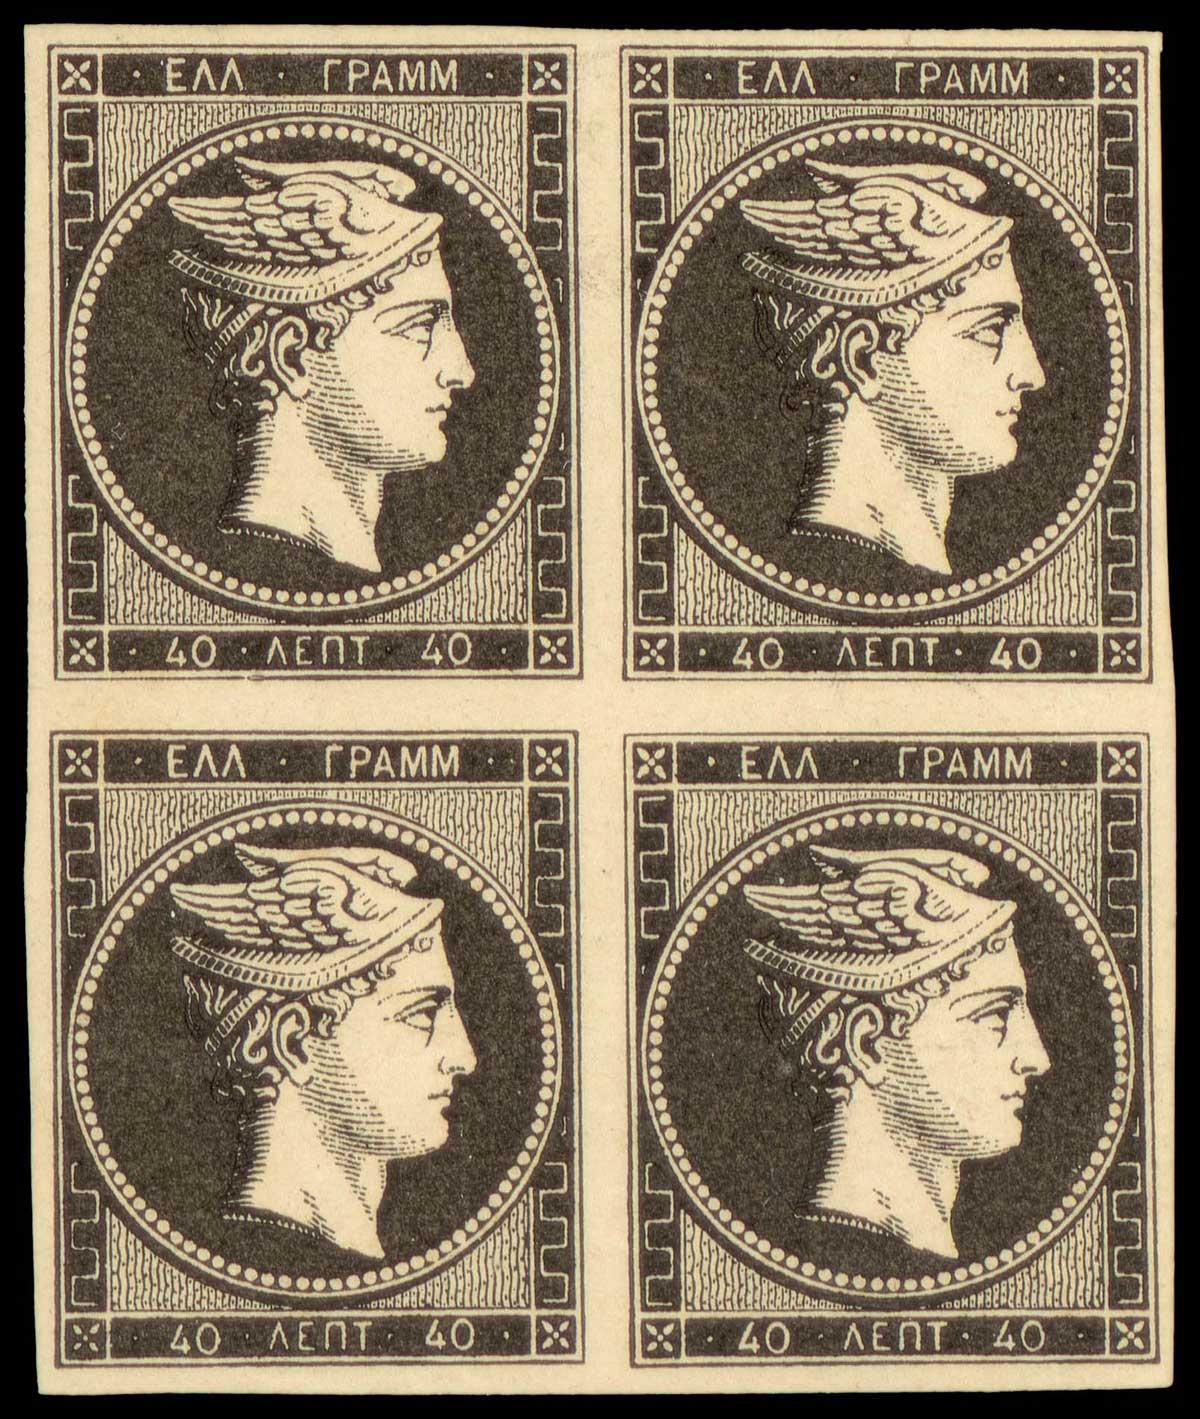 Lot 10 - GREECE-  LARGE HERMES HEAD large hermes head -  A. Karamitsos Public & LIVE Bid Auction 600 Coins, Medals & Banknotes